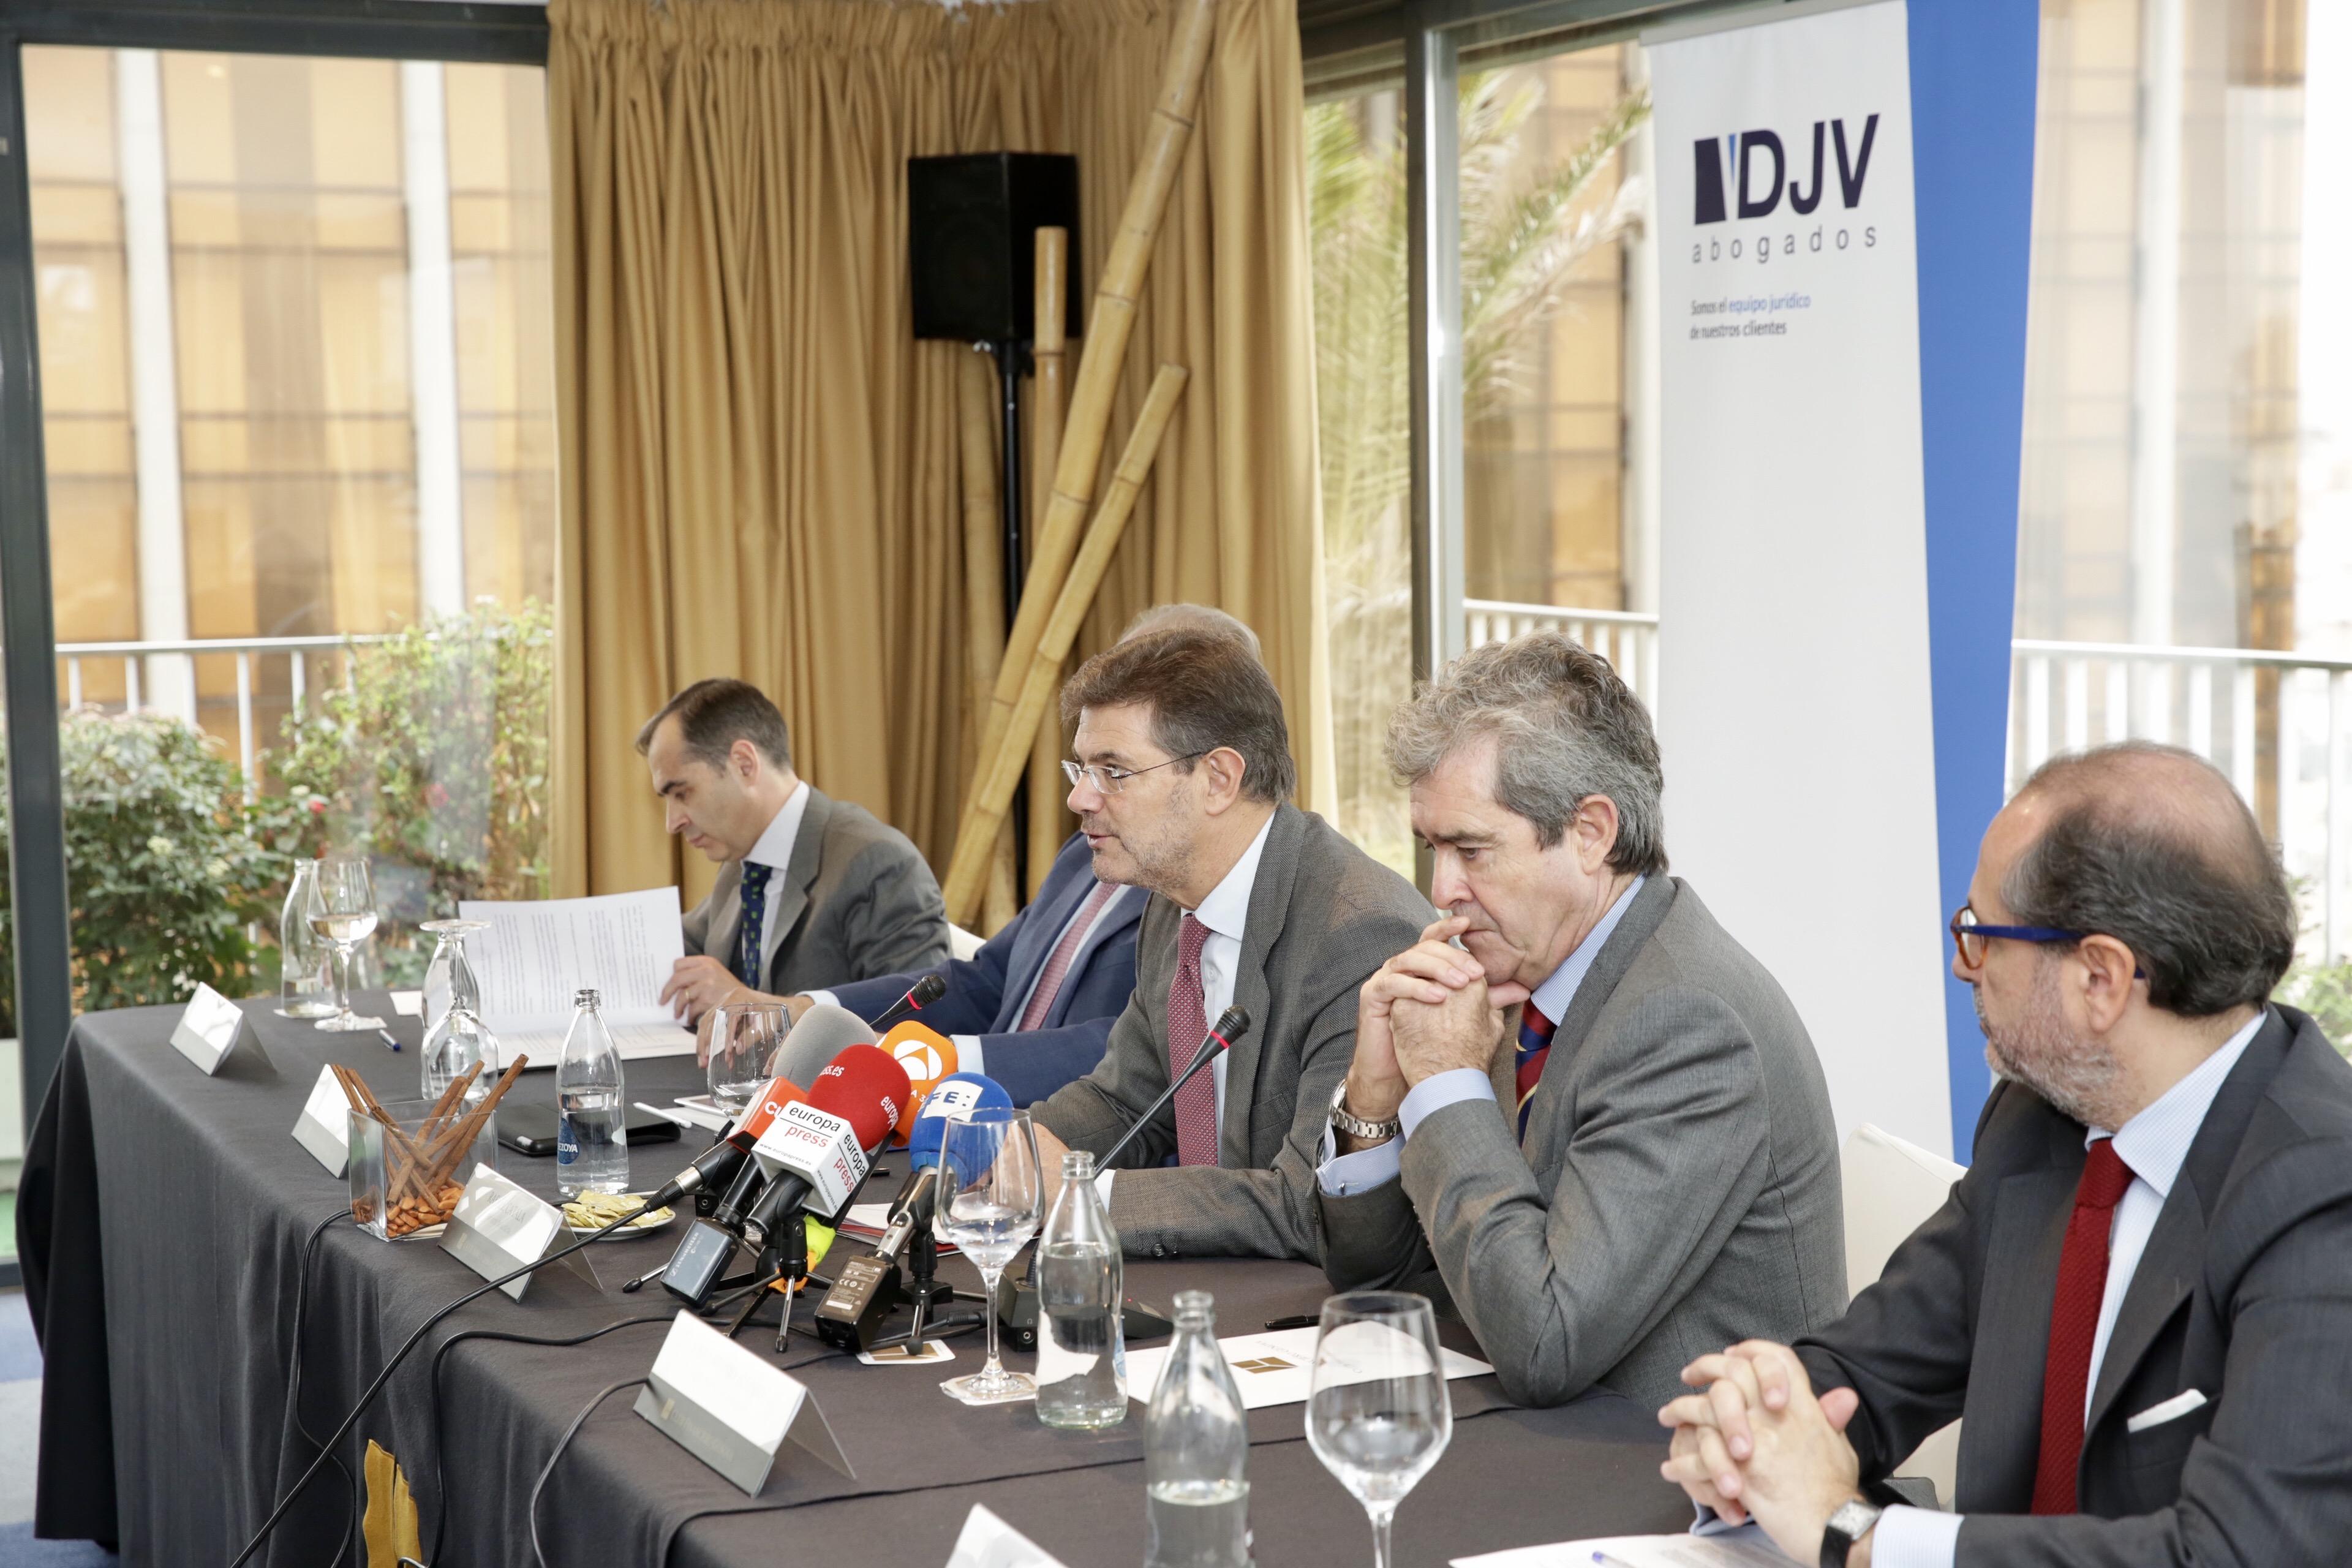 Rafael Catalá Participa En Un Desayuno Sobre Compliance Organizado Por DJV Abogados